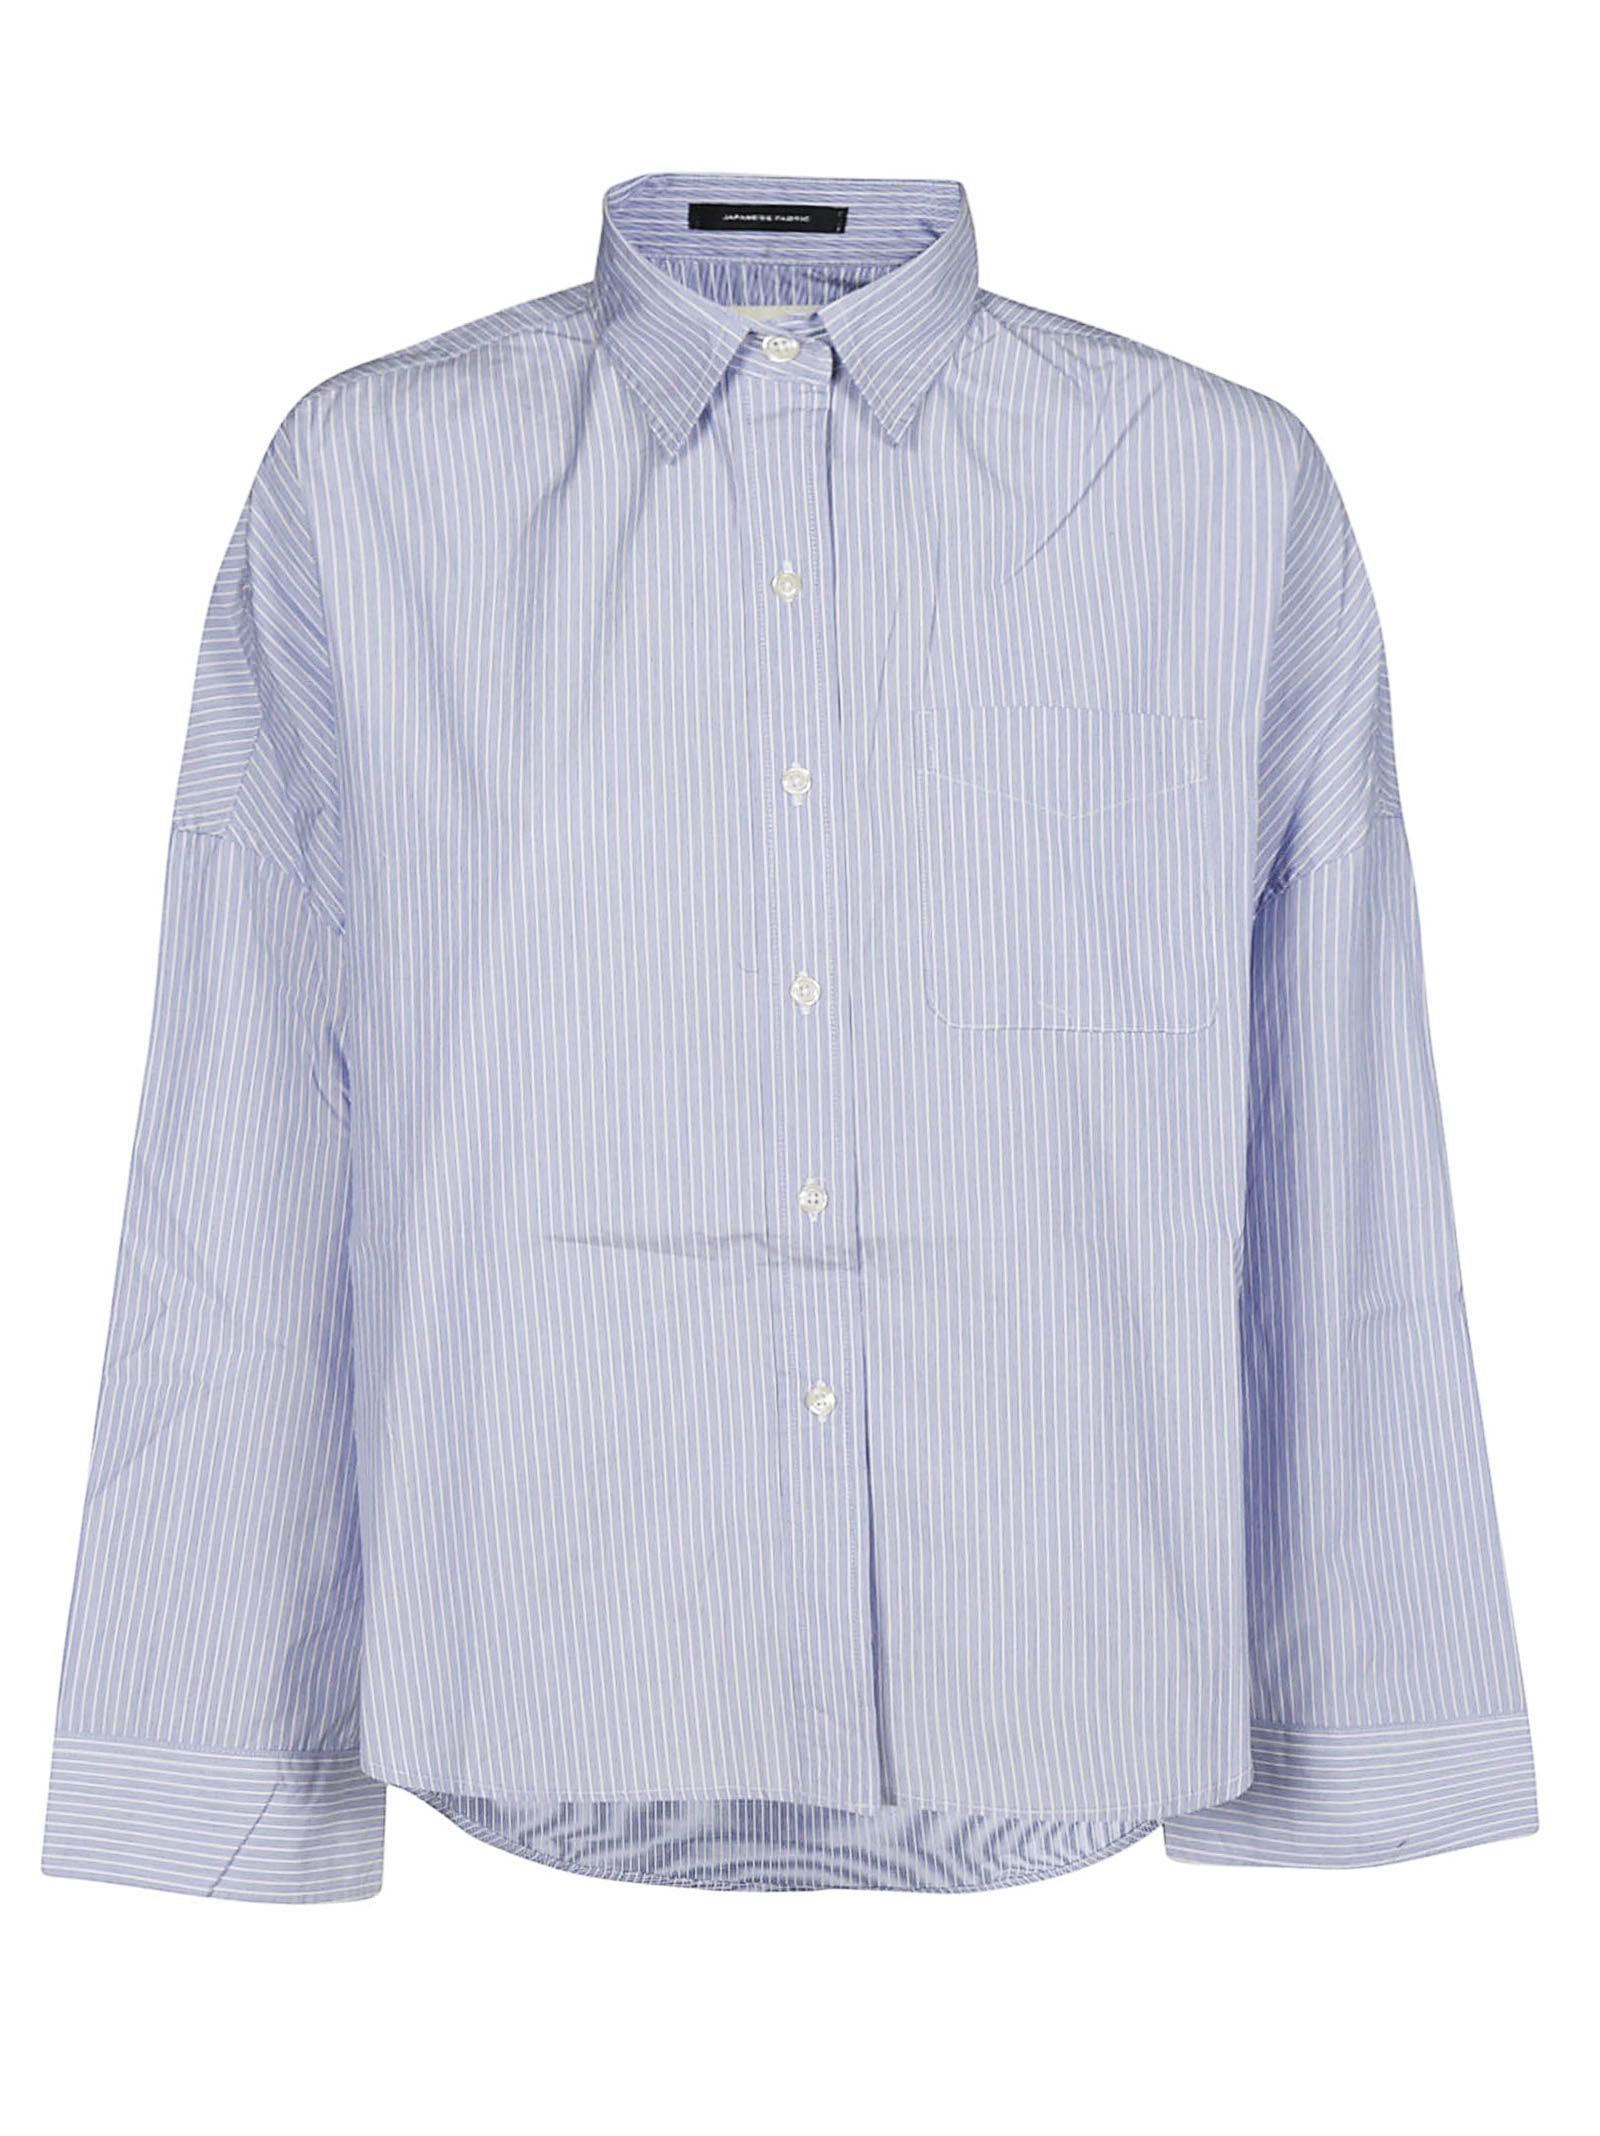 cf67376b05 R13 R13 Striped Print Cropped Shirt - Light Blue/White - 10831024 ...